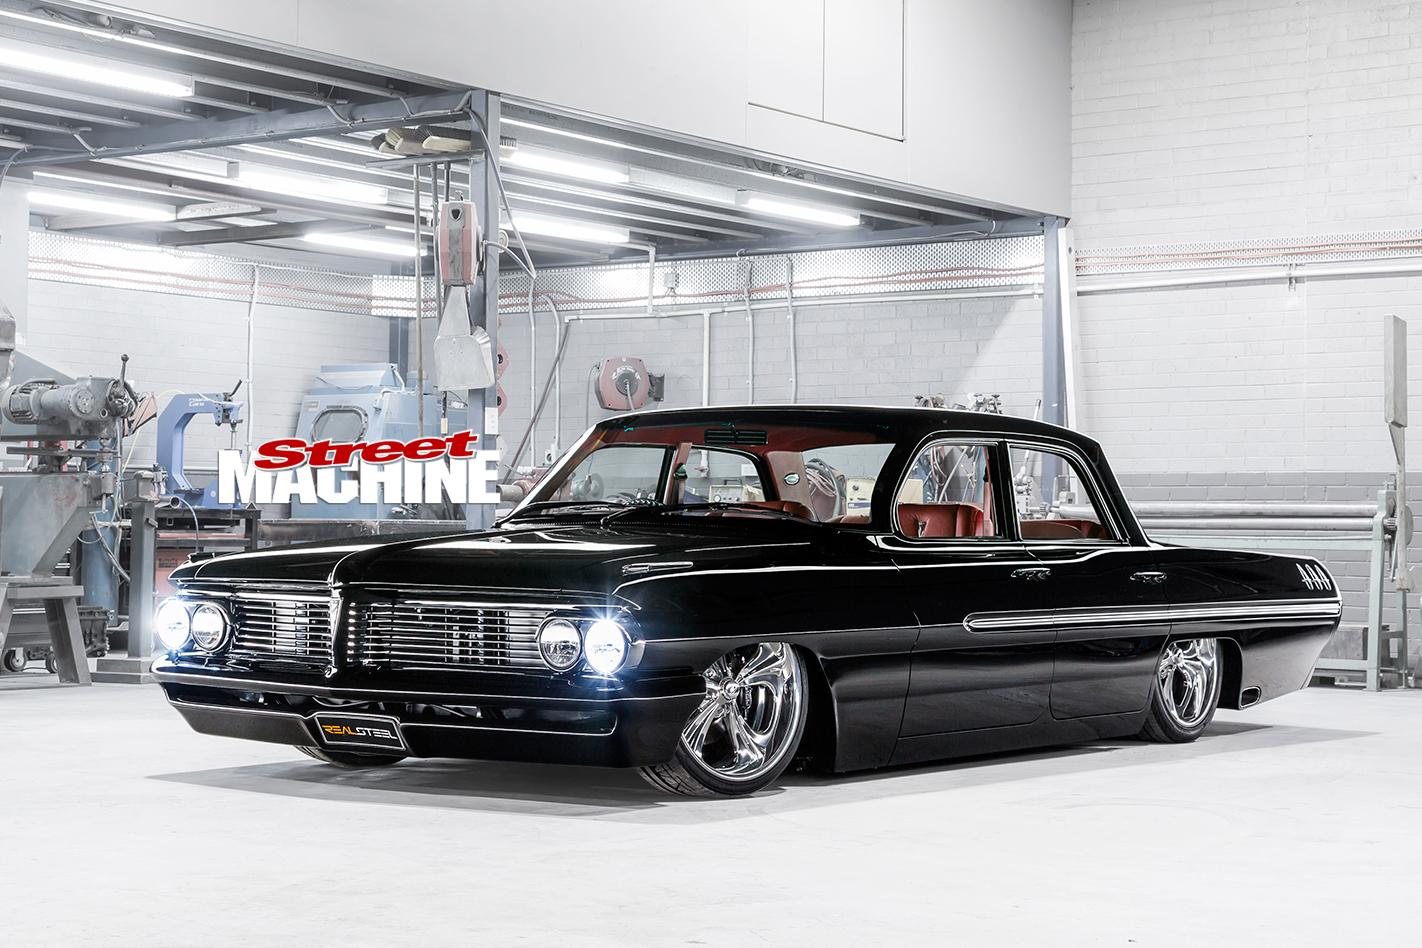 Street Machine June 2016 1950s Pontiac Laurentian